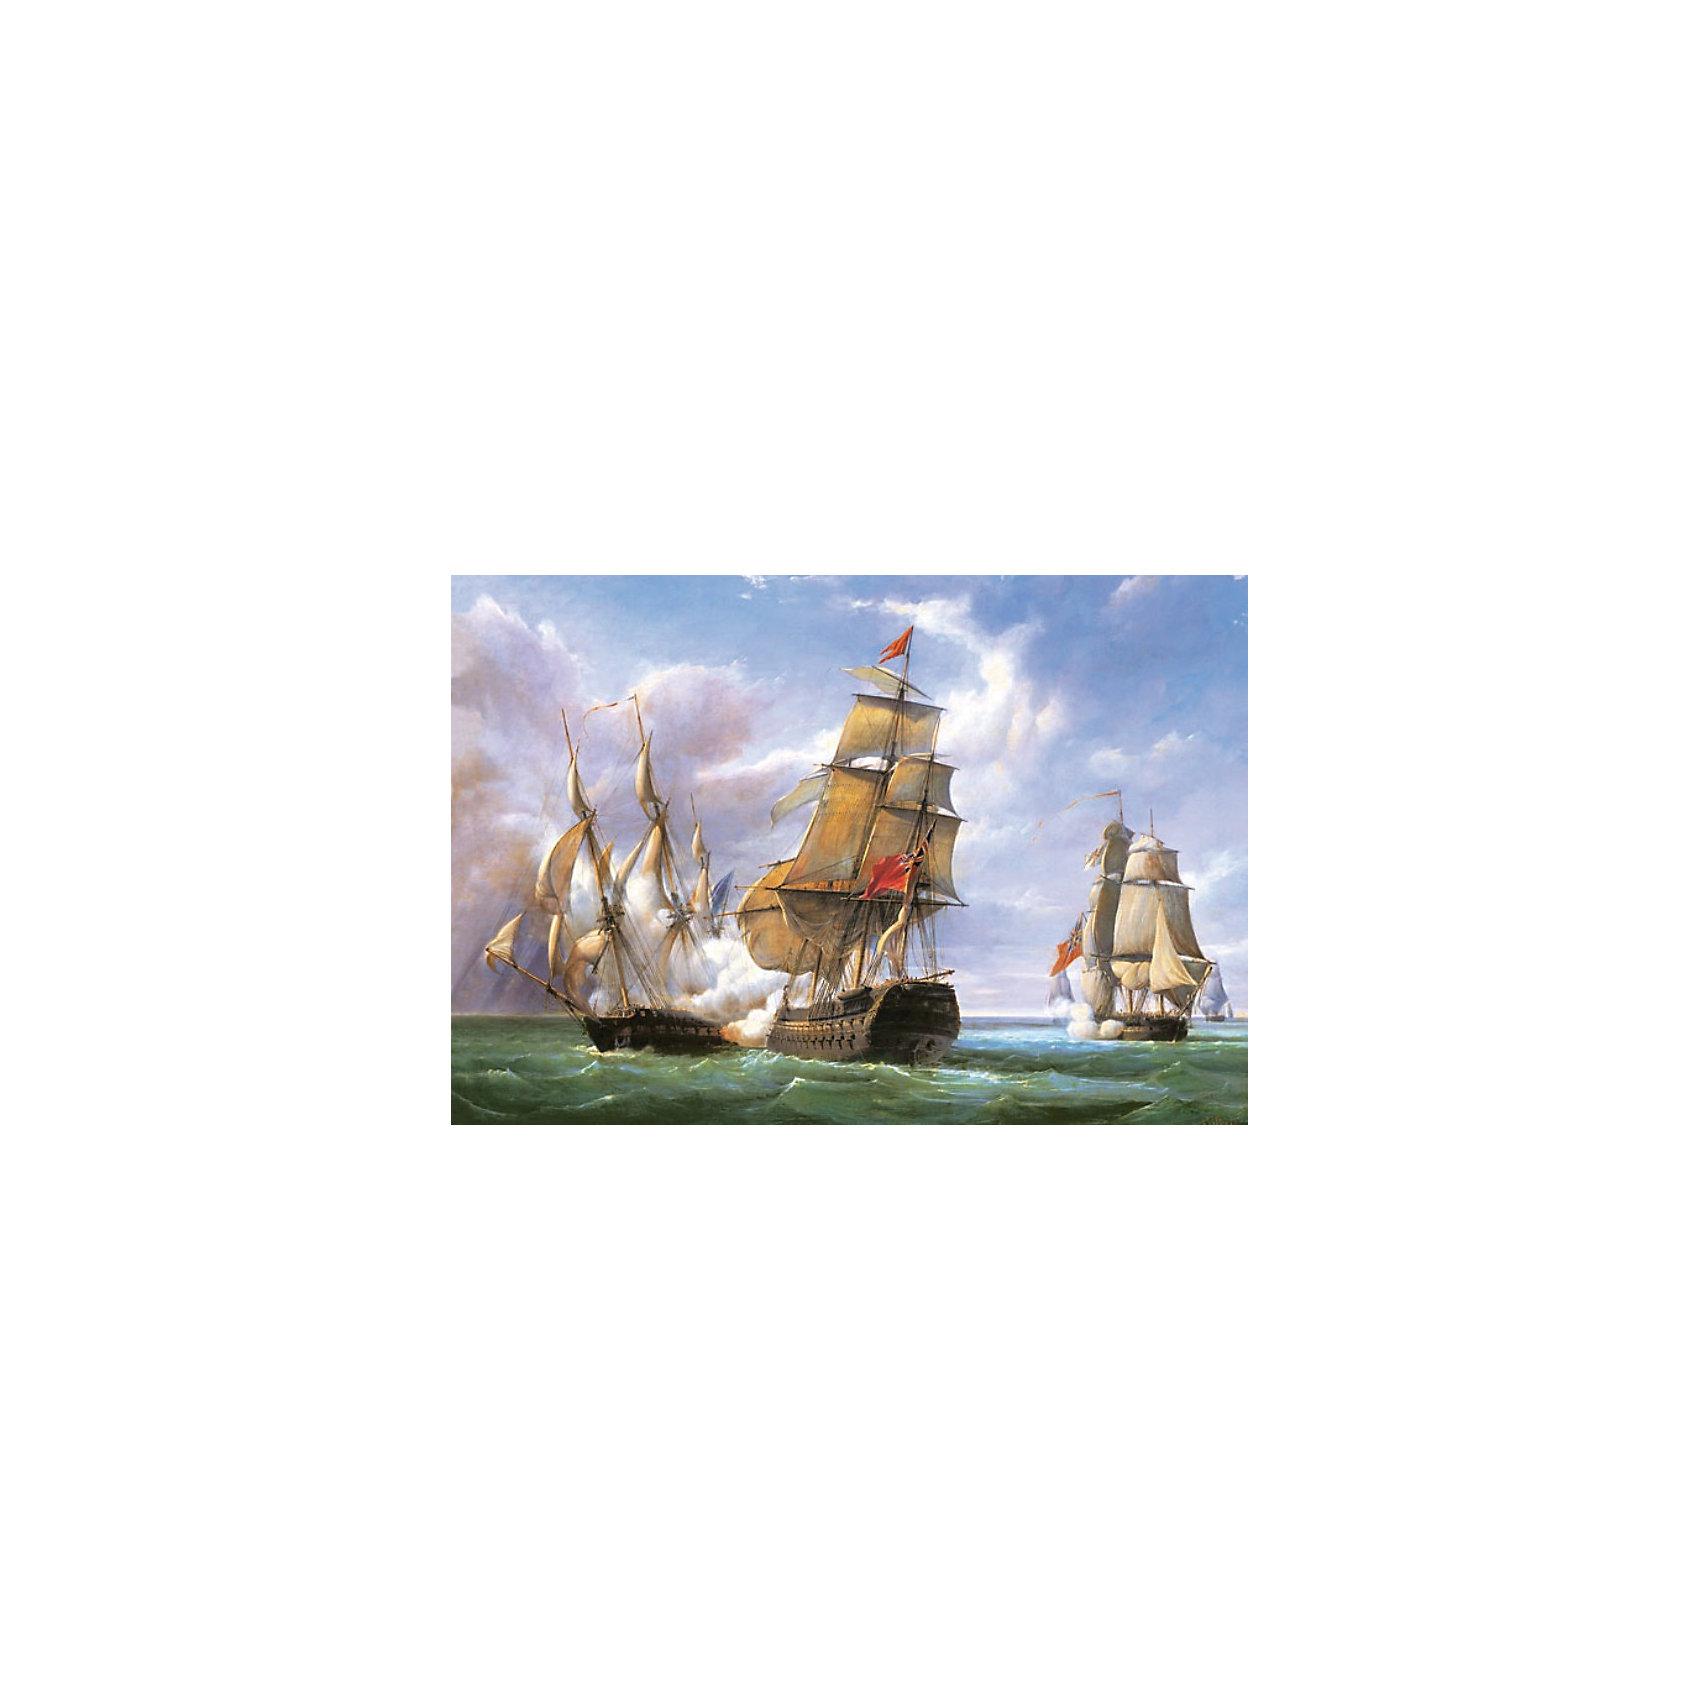 Пазлы Парусник, 3000 деталей, CastorlandПазлы Парусник, 3000 деталей - яркий, красивый и качественный пазл от Castorland на морскую тематику.<br><br>Дополнительная информация:<br><br>- Кол-во деталей: 3000 шт.<br>- Материал: картон.<br>- Размер собранной картинки: 68 х 92 см.<br>- Размеры: 385 х 275 х 52 мм.<br><br>Ширина мм: 385<br>Глубина мм: 50<br>Высота мм: 275<br>Вес г: 1000<br>Возраст от месяцев: 192<br>Возраст до месяцев: 1188<br>Пол: Унисекс<br>Возраст: Детский<br>Количество деталей: 3000<br>SKU: 2562335